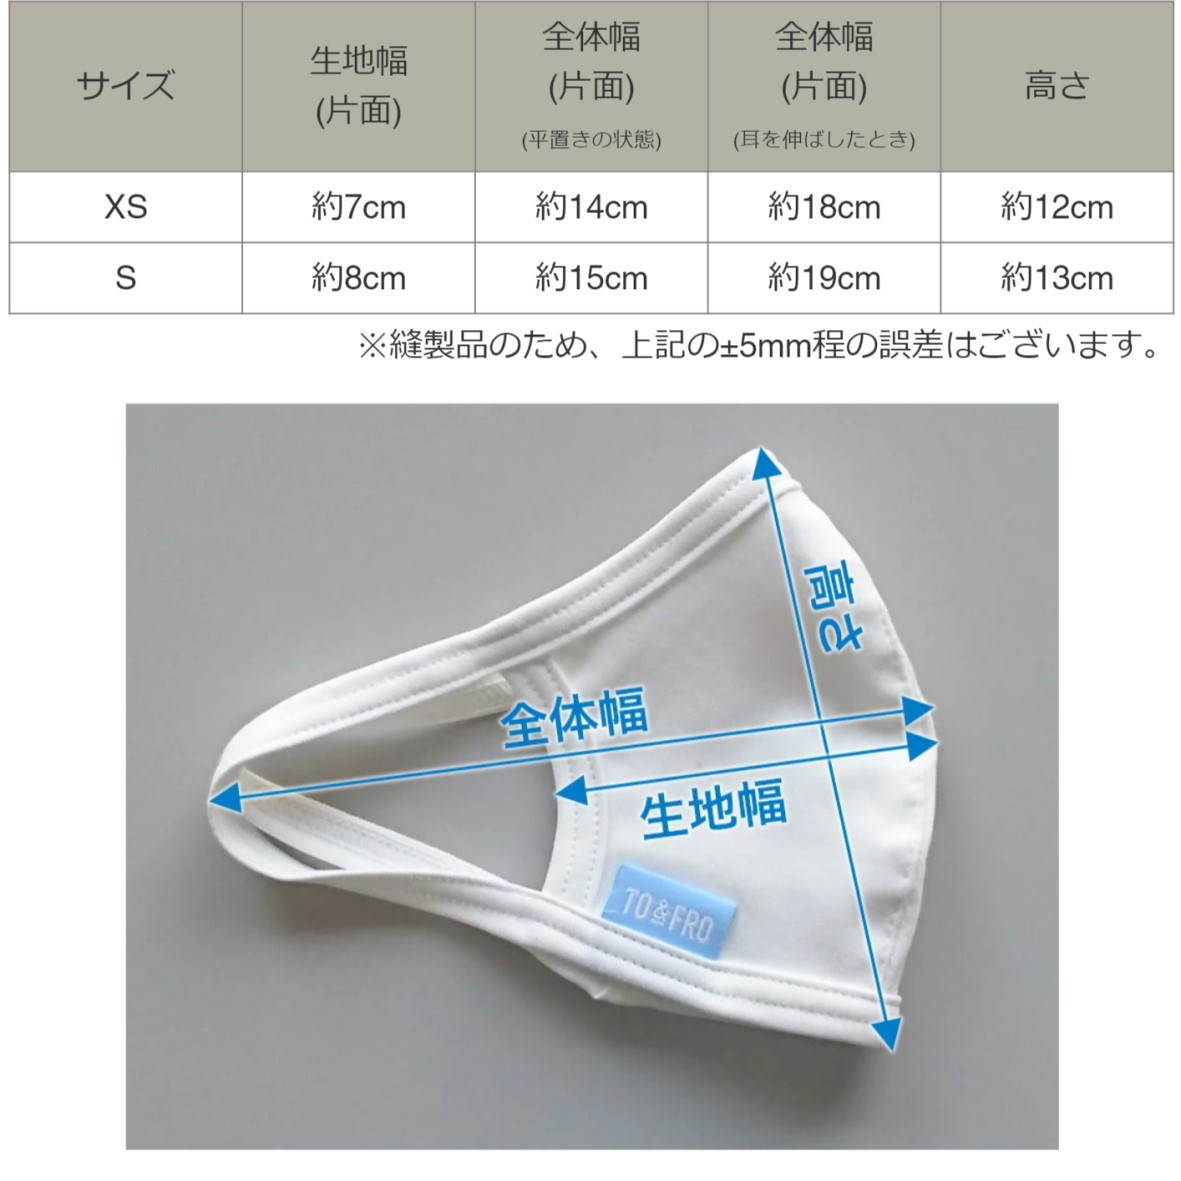 【XS/S】真夏の夏マスク (売り尽くしSALE)